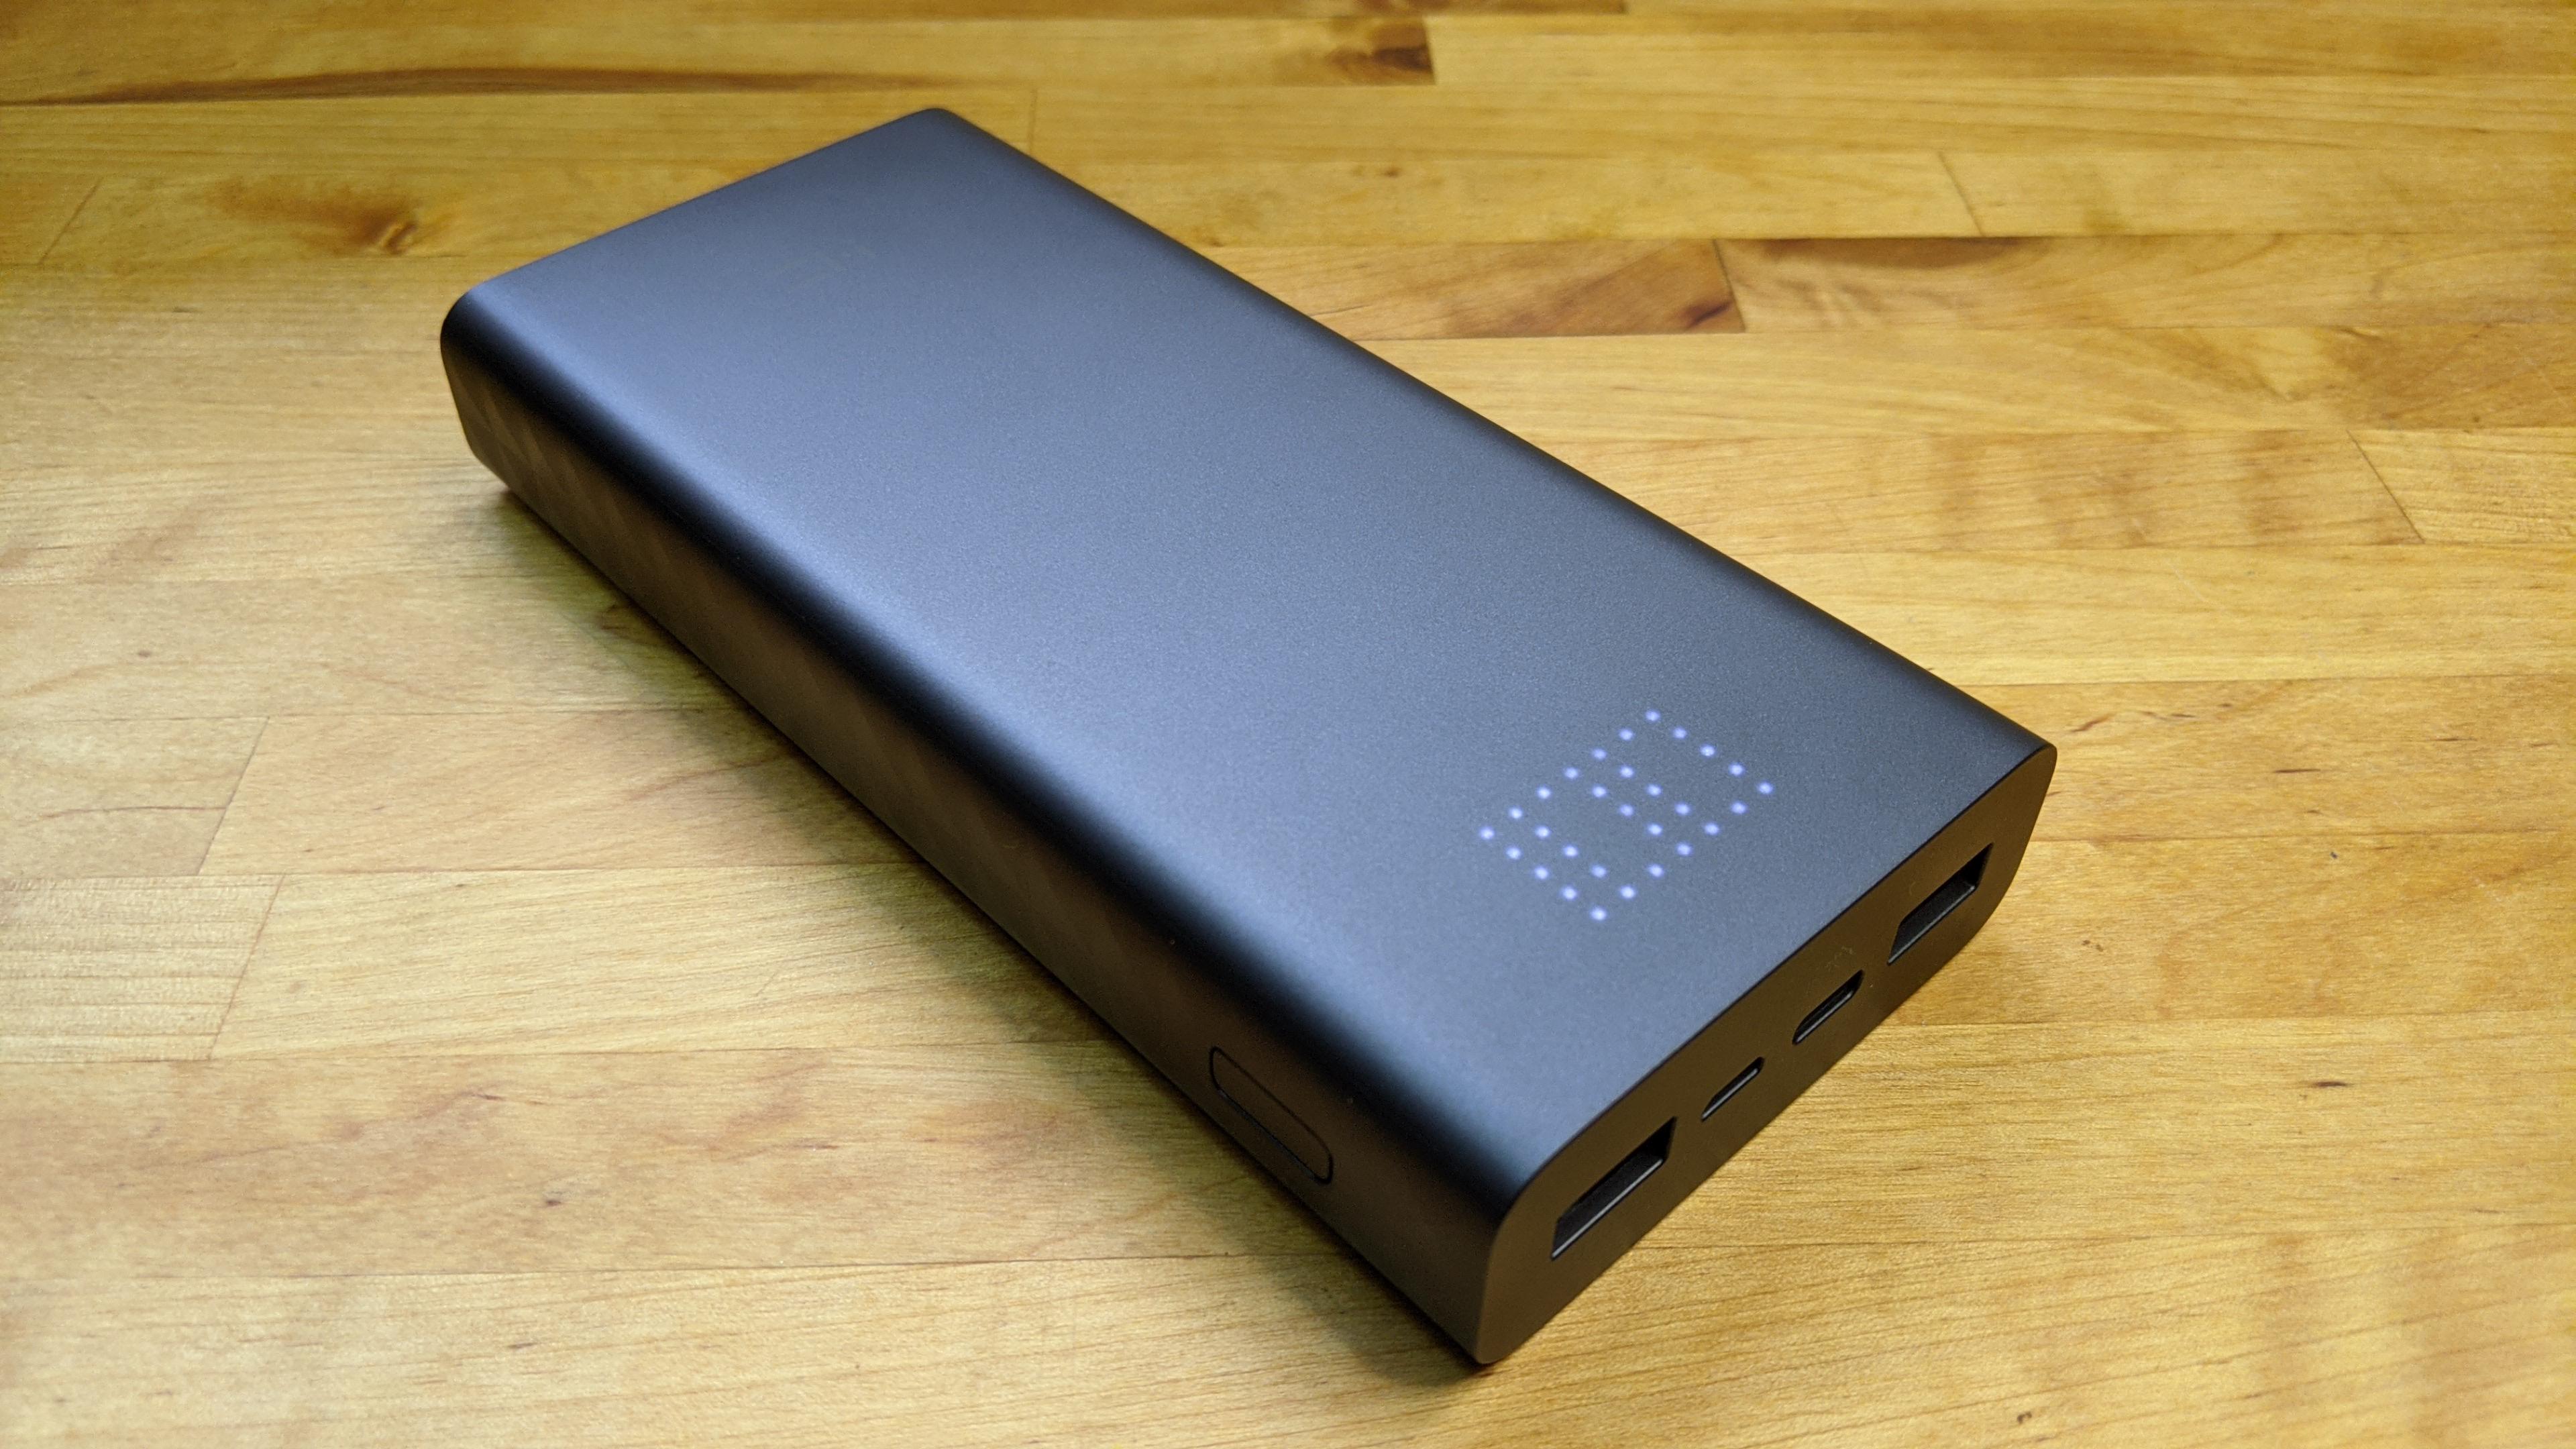 ZMI PowerPack Aura 20K QB822 power bank